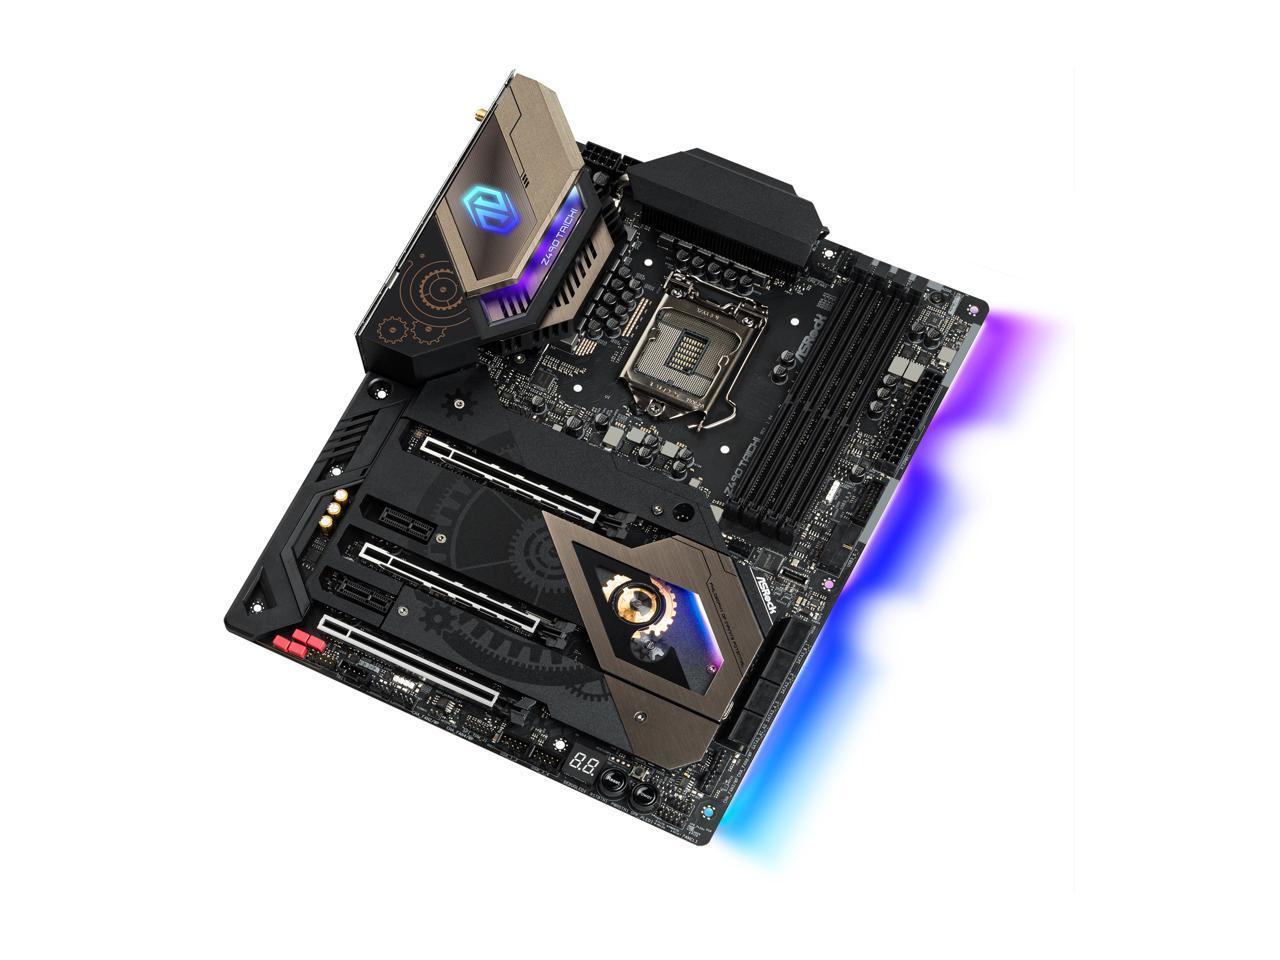 ASRock Z490 Taichi LGA 1200 ATX Intel Motherboard - Newegg.com